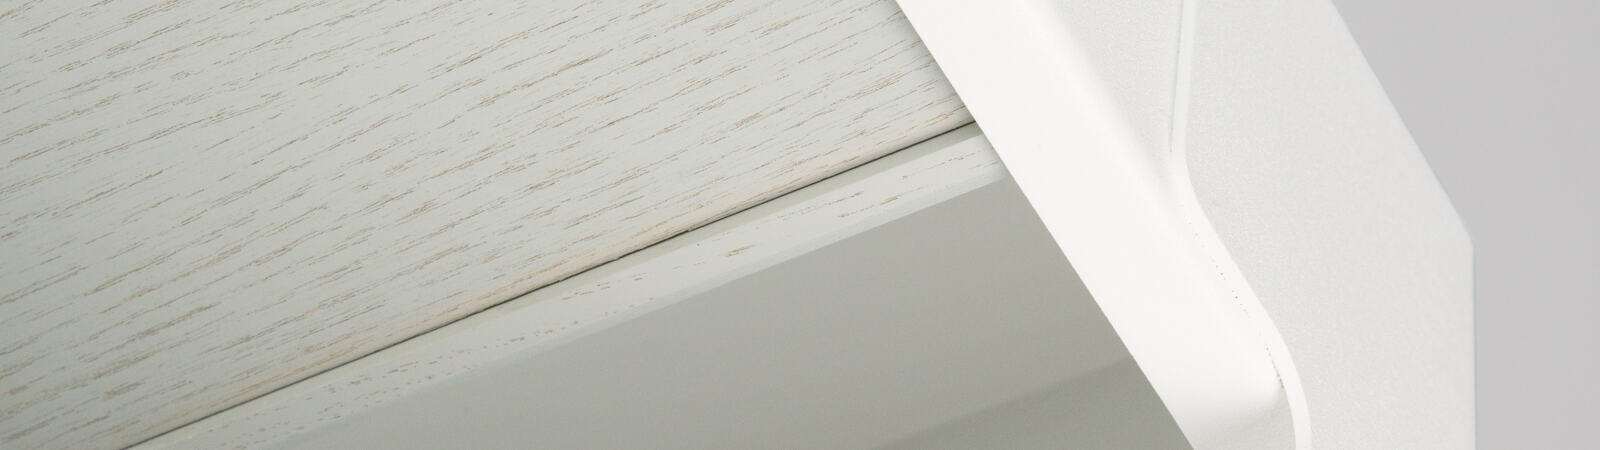 Büro & Zuhause, Papierkorb, Magnetpinnwand